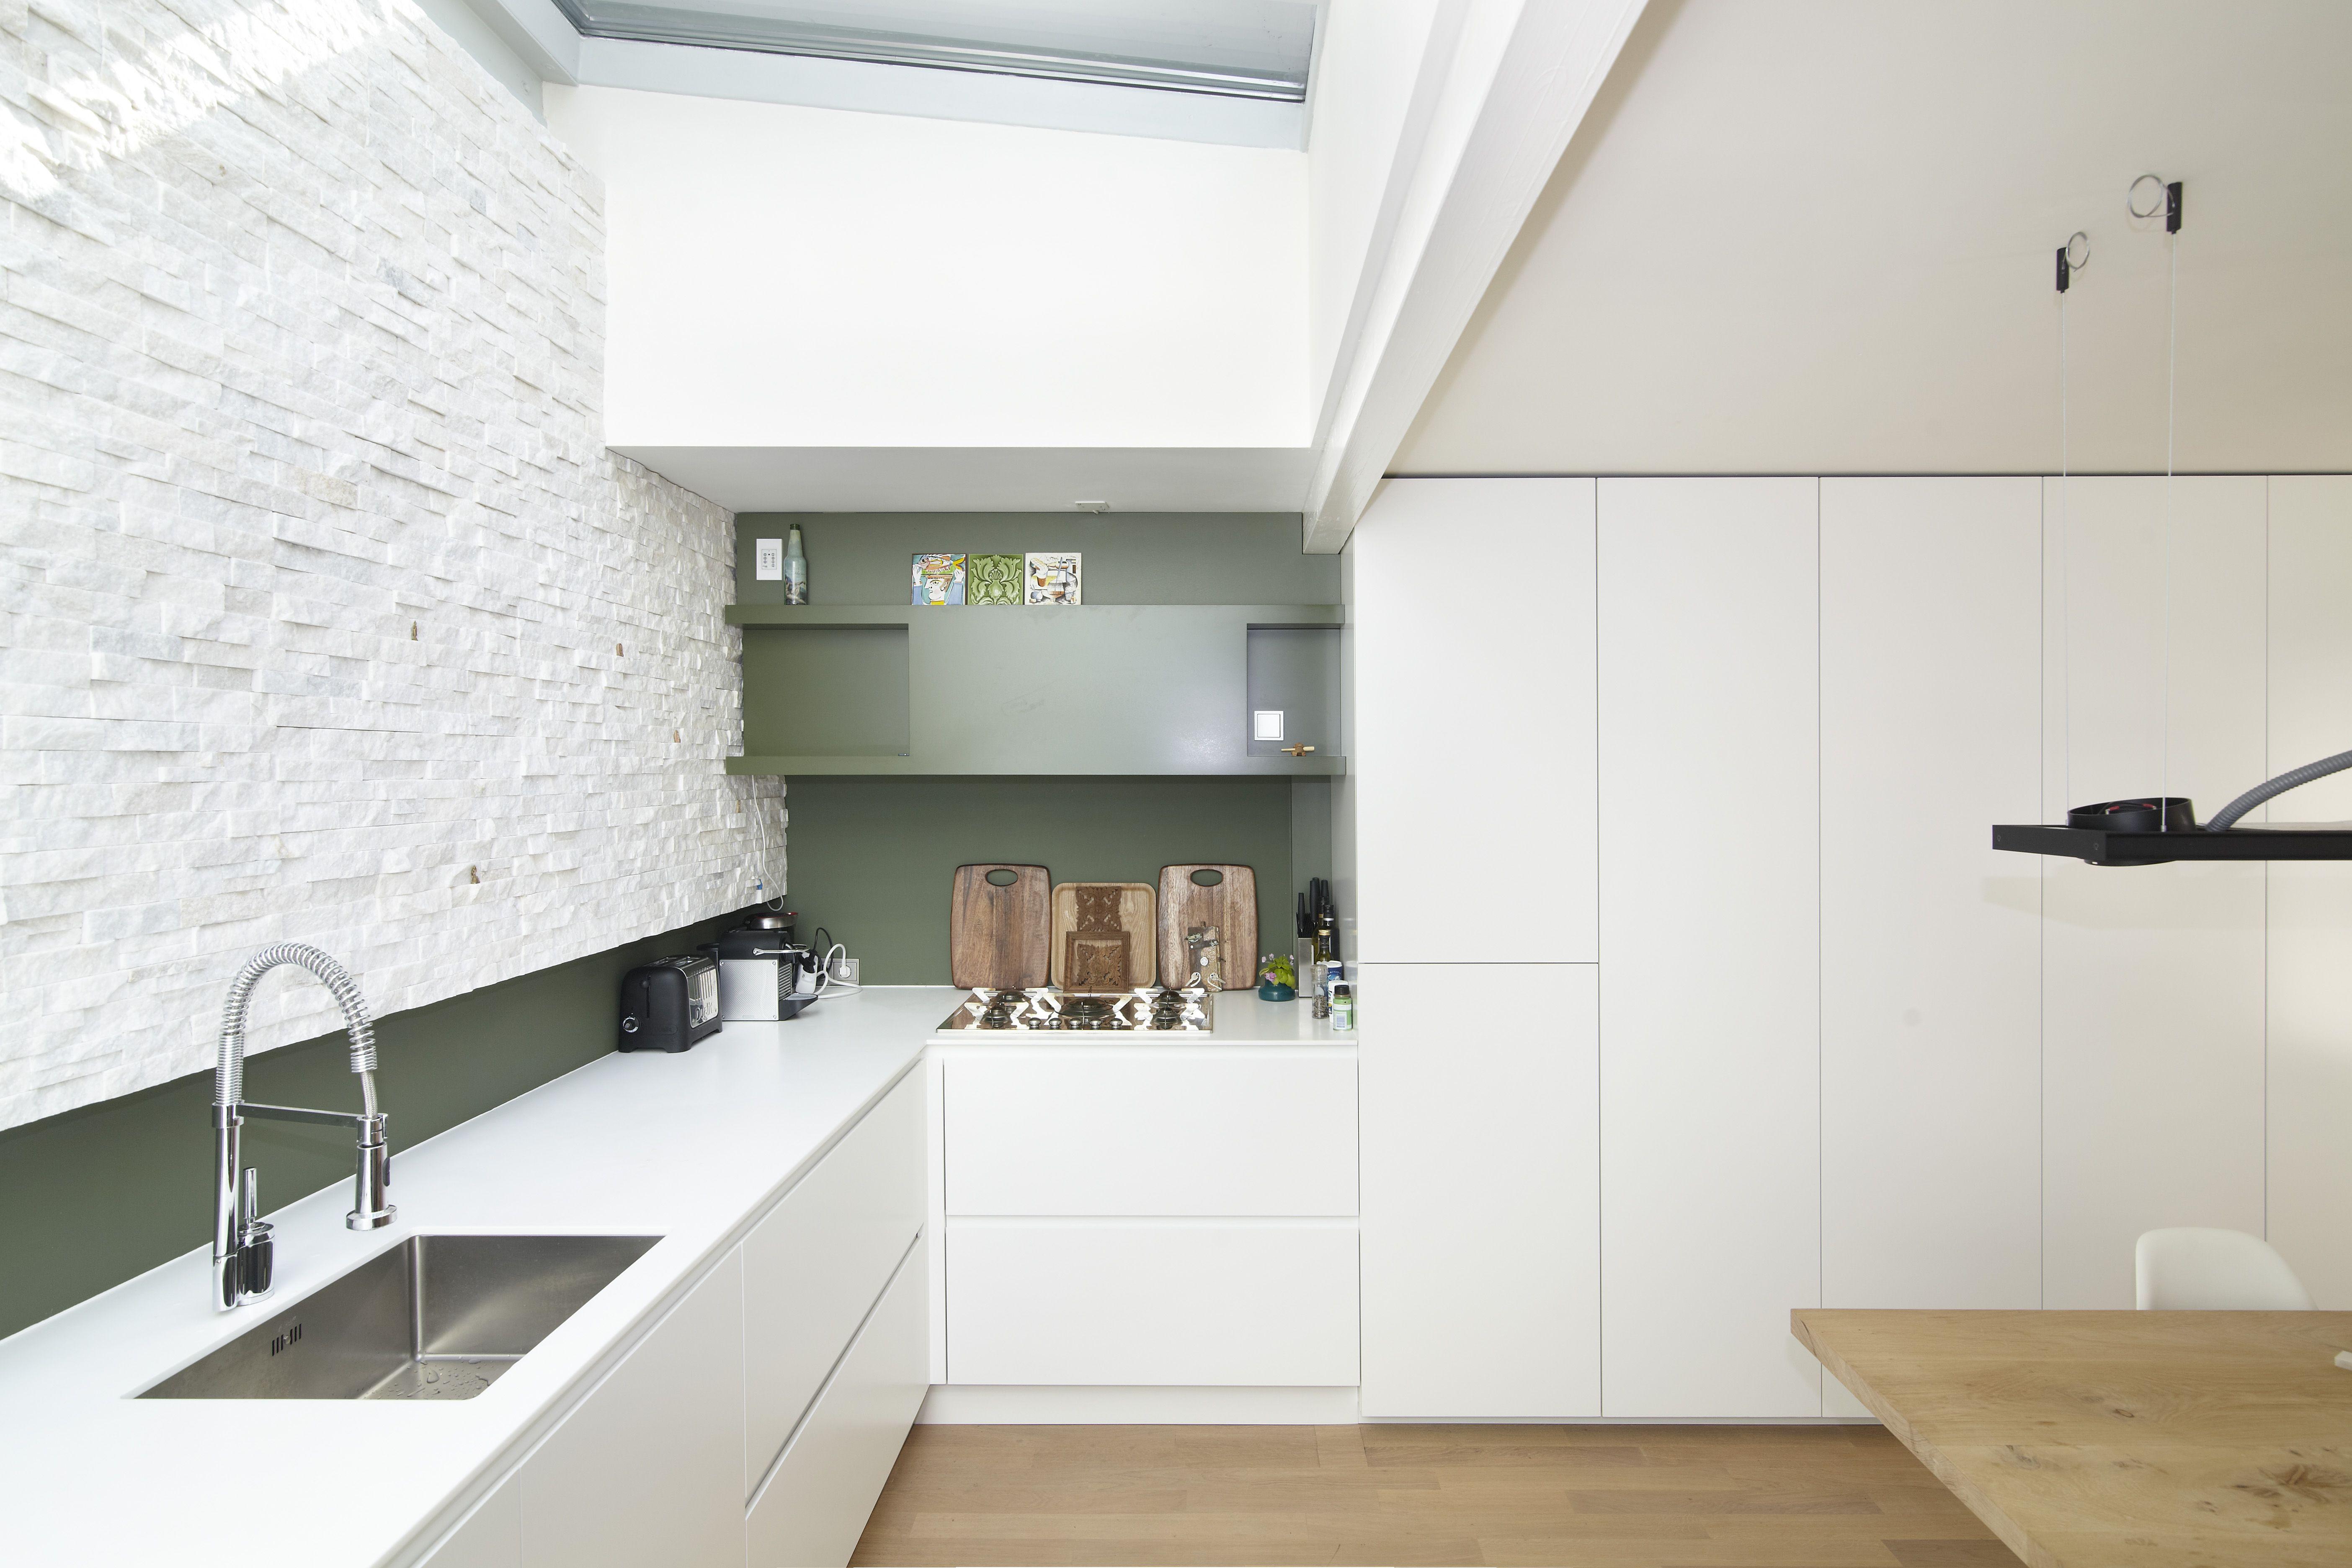 Keuken mdf gespoten wit eken hout steen muur opmaat